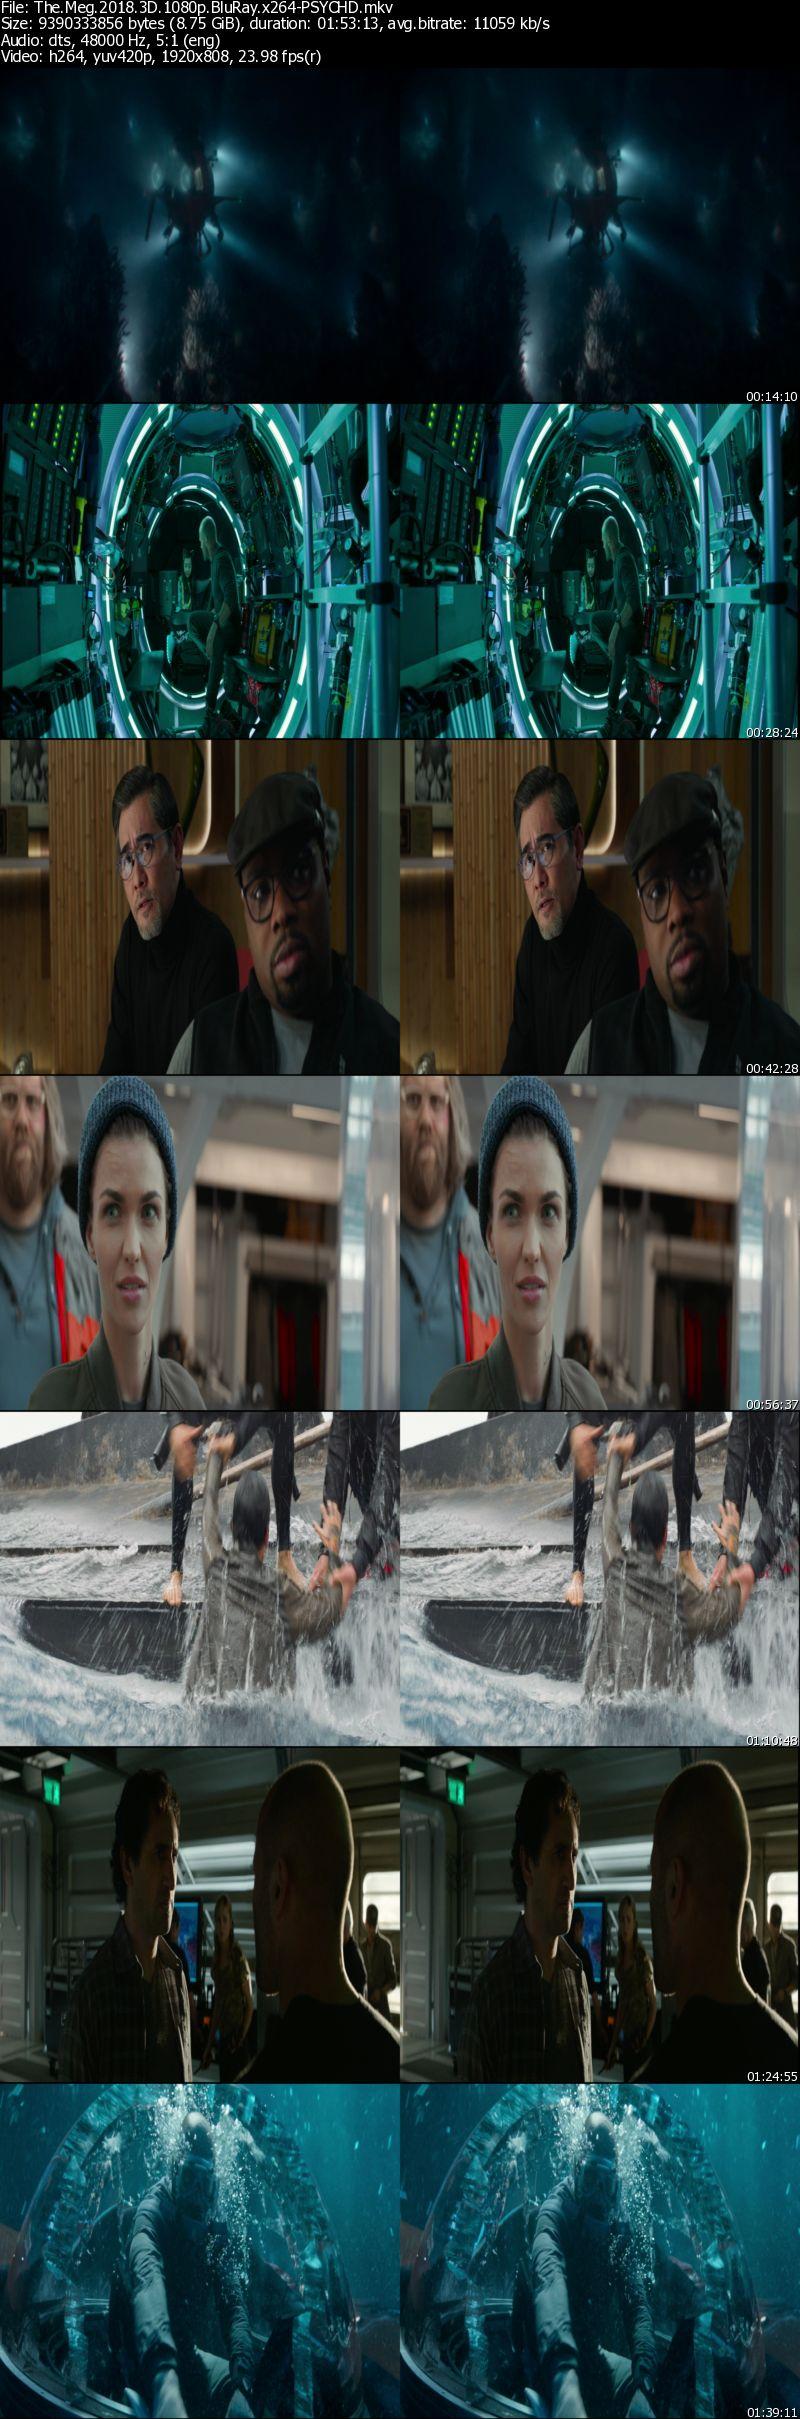 The Meg (2018) 3D 1080p BluRay Half-SBS x264-PSYCHD